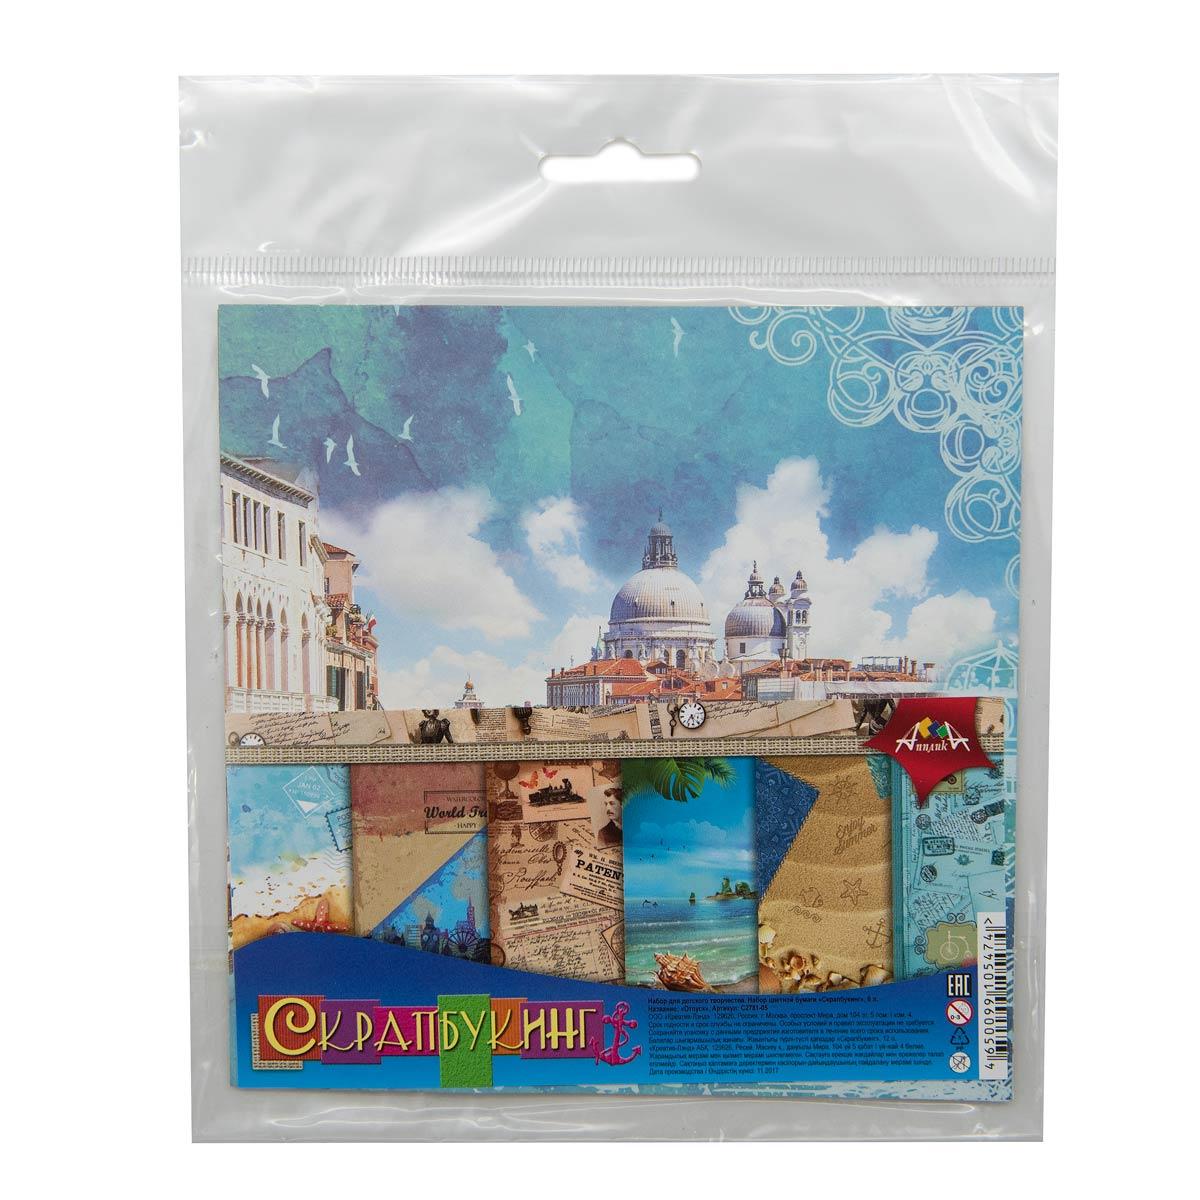 С2781-05 Цветная бумага для скрапбукинга. 6л. 15x15 'Отпуск'